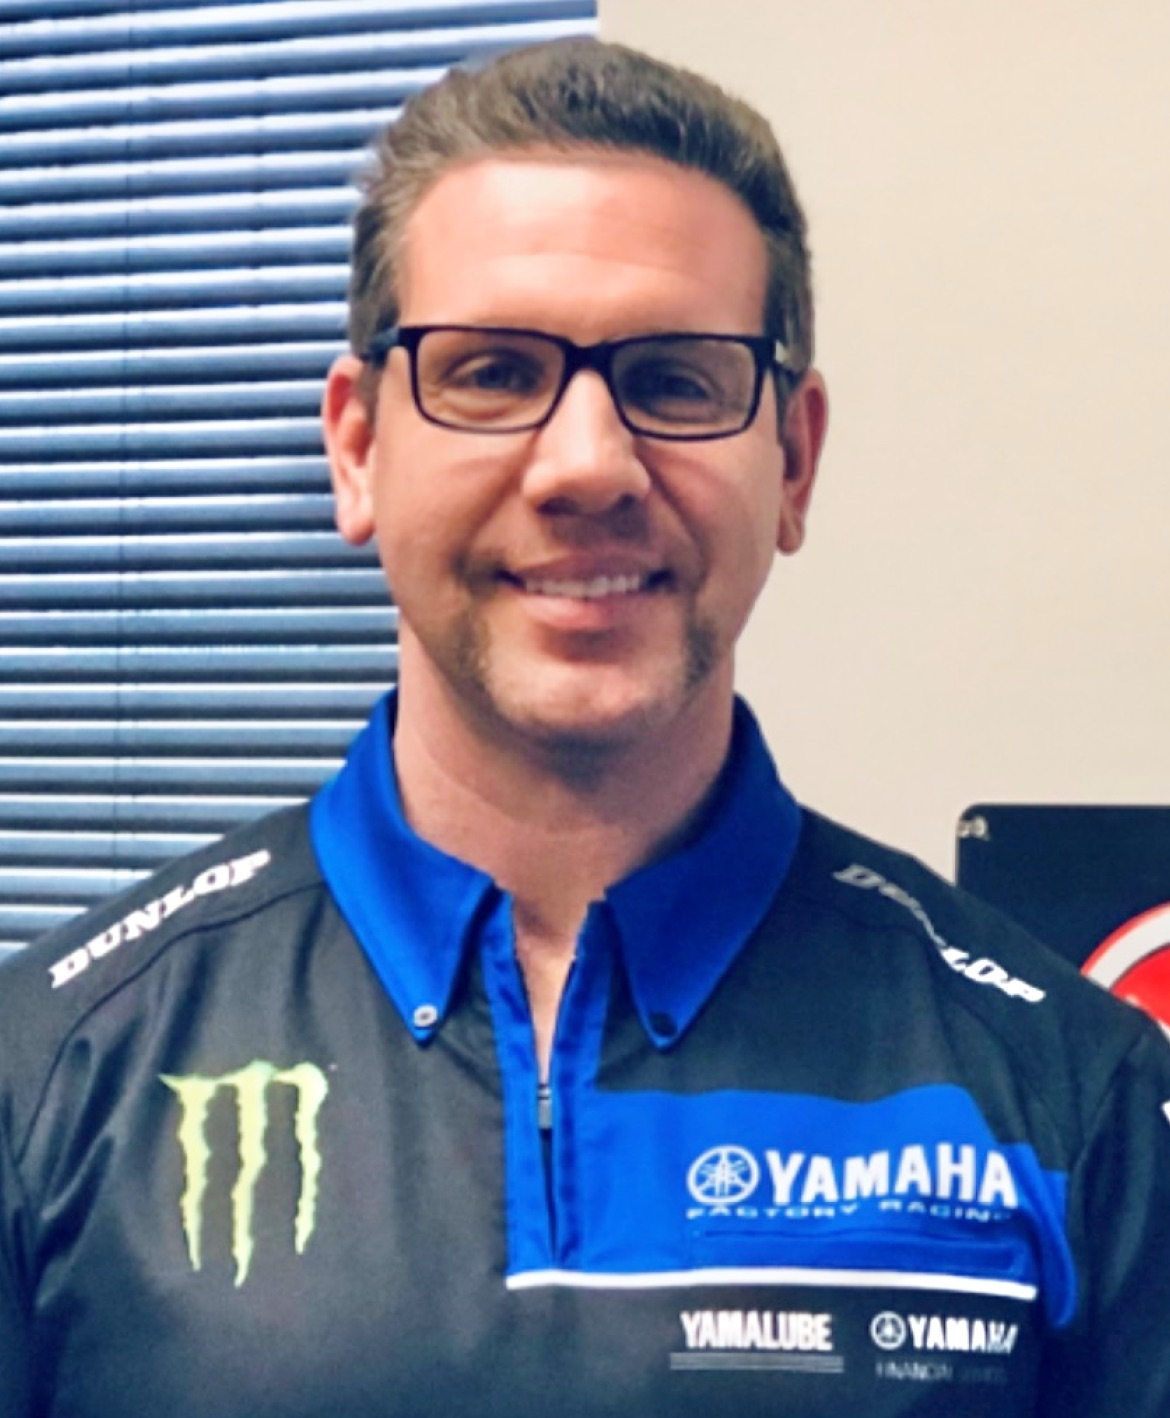 210322 Yamaha's Matt Potter Joins MSF Board of Trustees